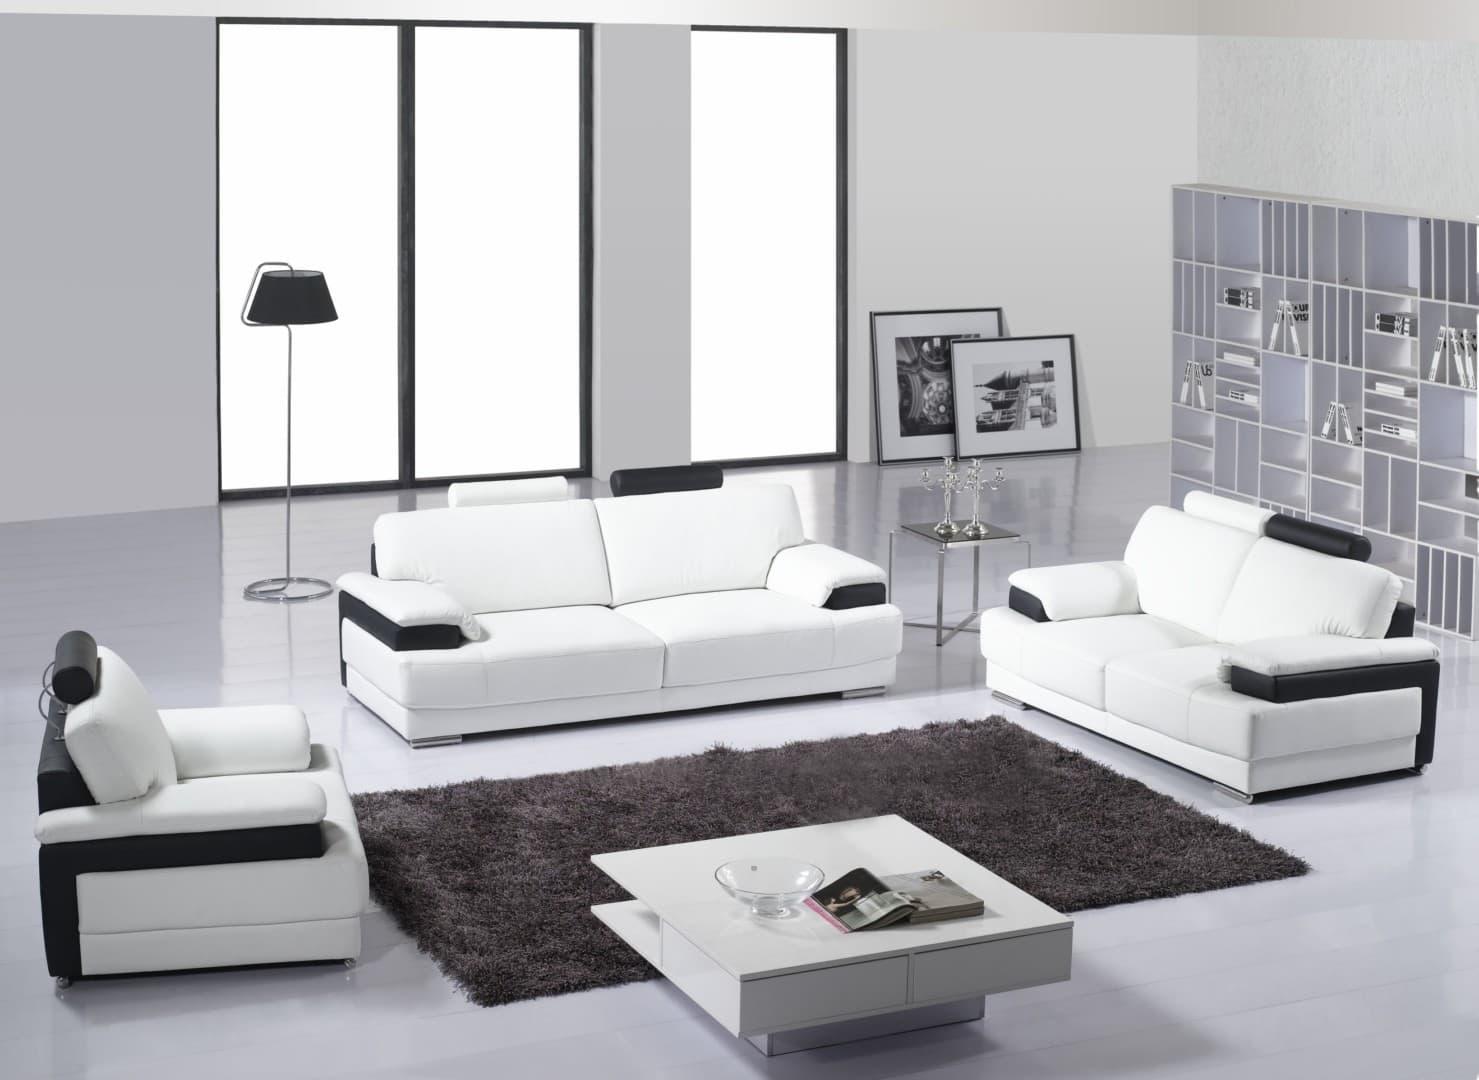 ensemble canap cuir olbia ensemble canap cuir 5 places 220x108 180x108 120x108. Black Bedroom Furniture Sets. Home Design Ideas